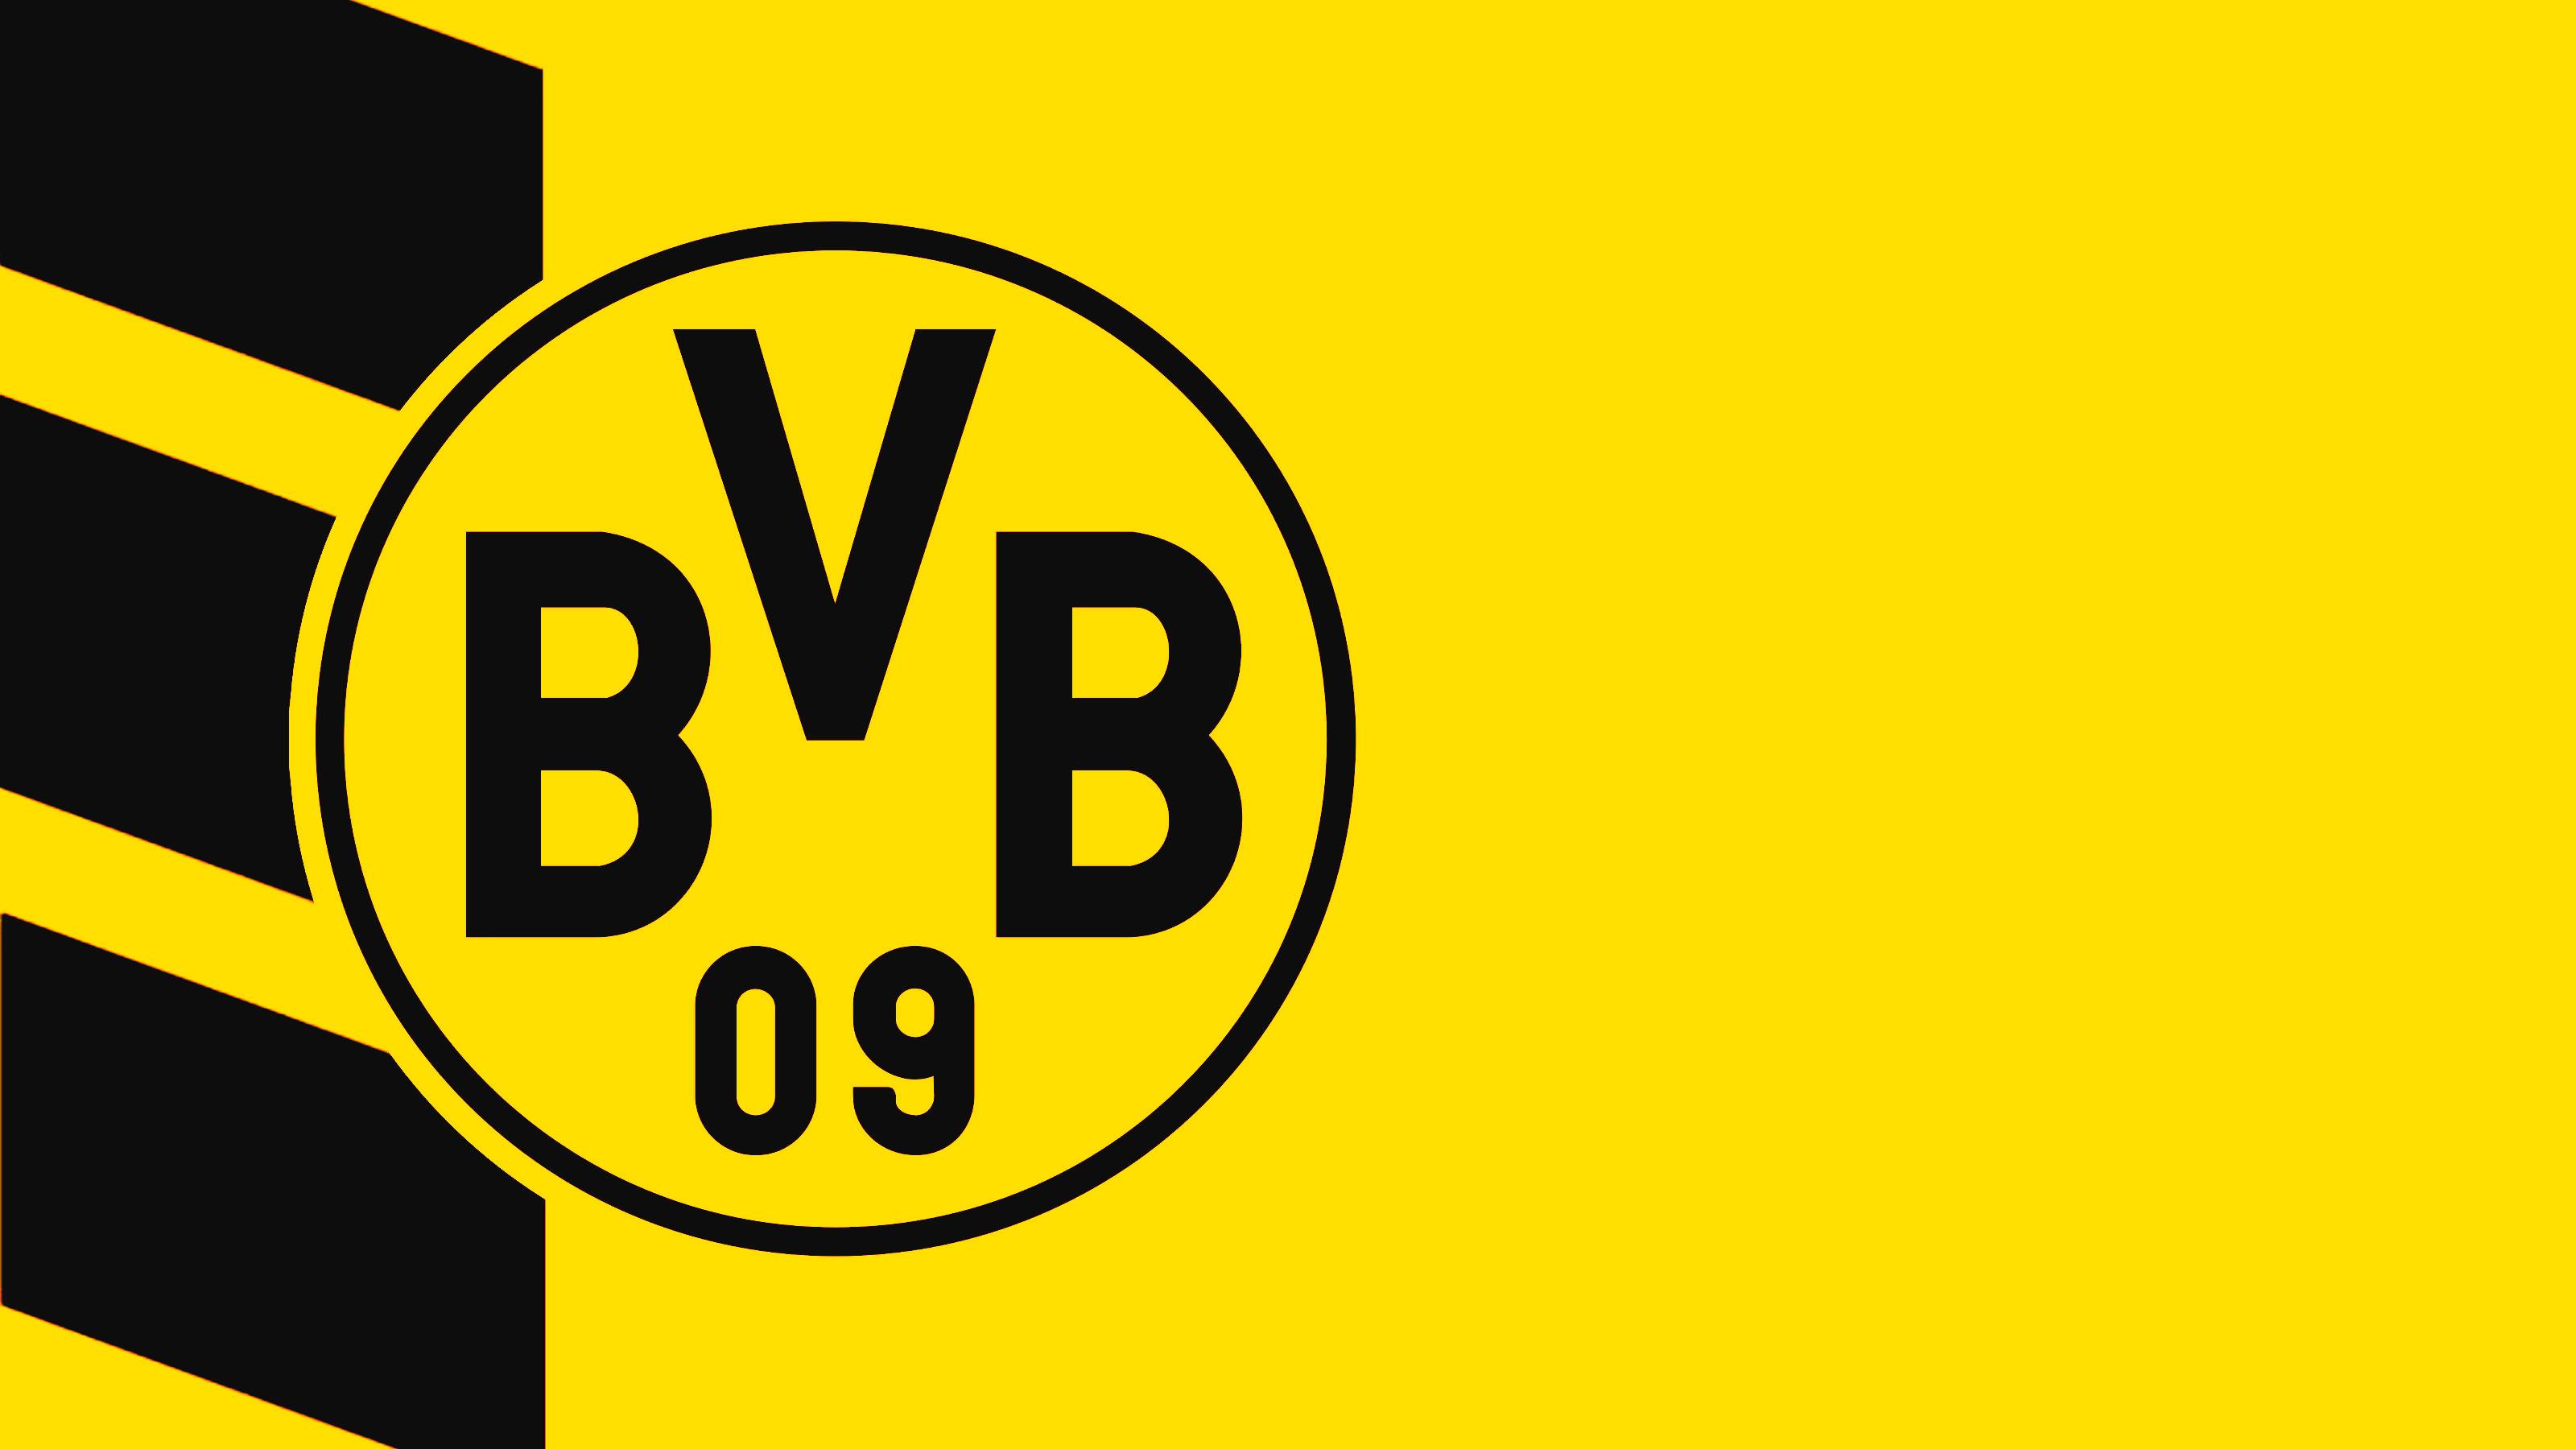 Bor Dortmund背景 ボルシアドルトムント壁紙 30x1800 Wallpapertip